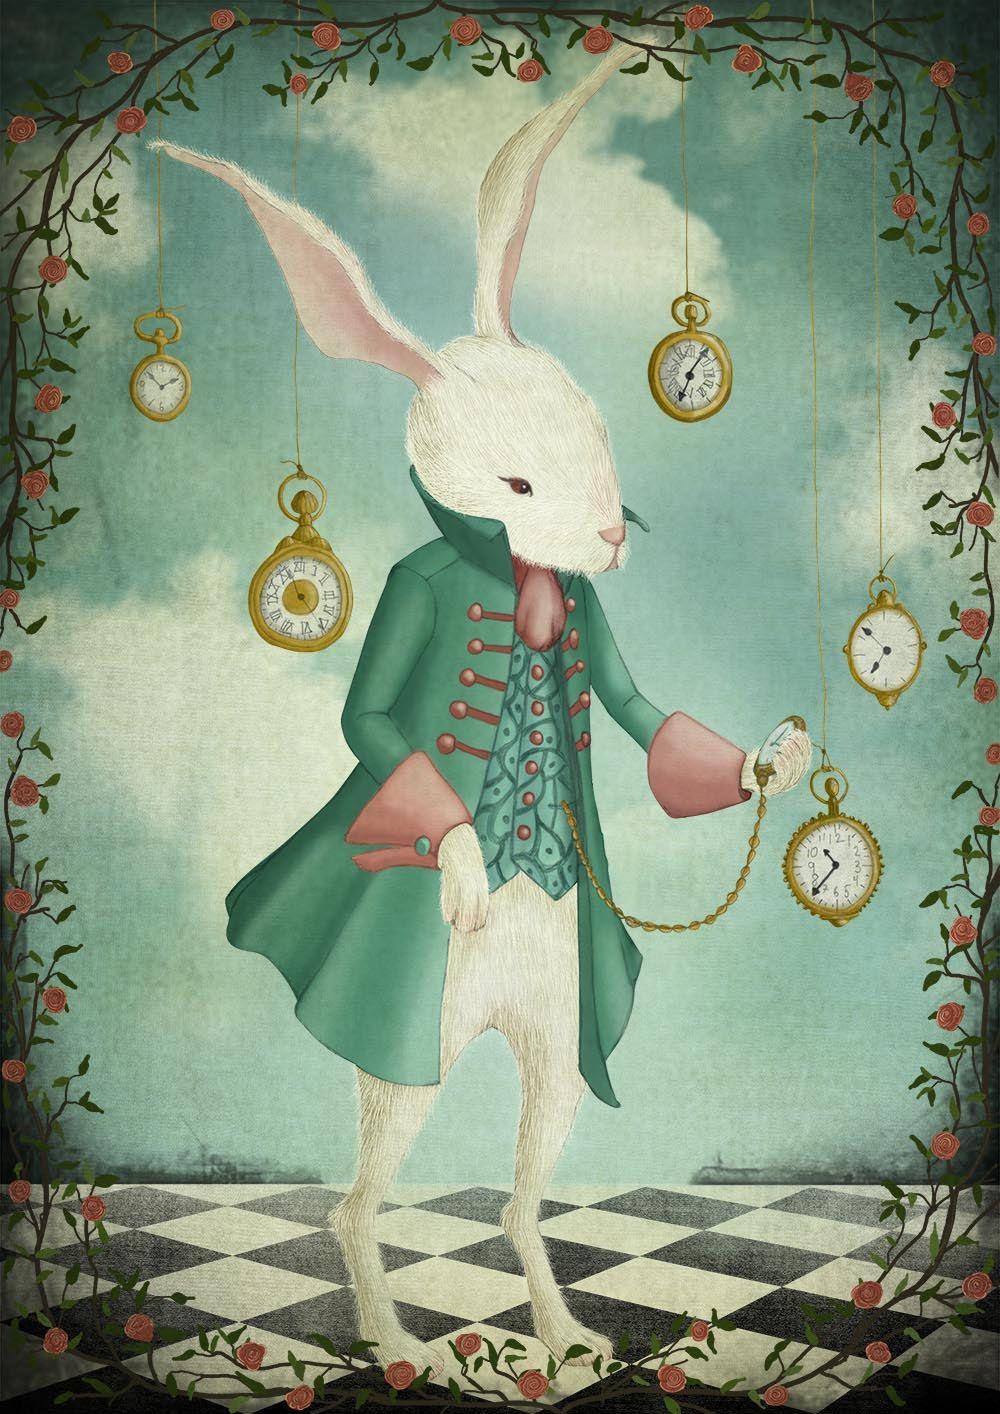 "The white rabbit - Illustration print (size 7"" x 5"") by majalin on Etsy"